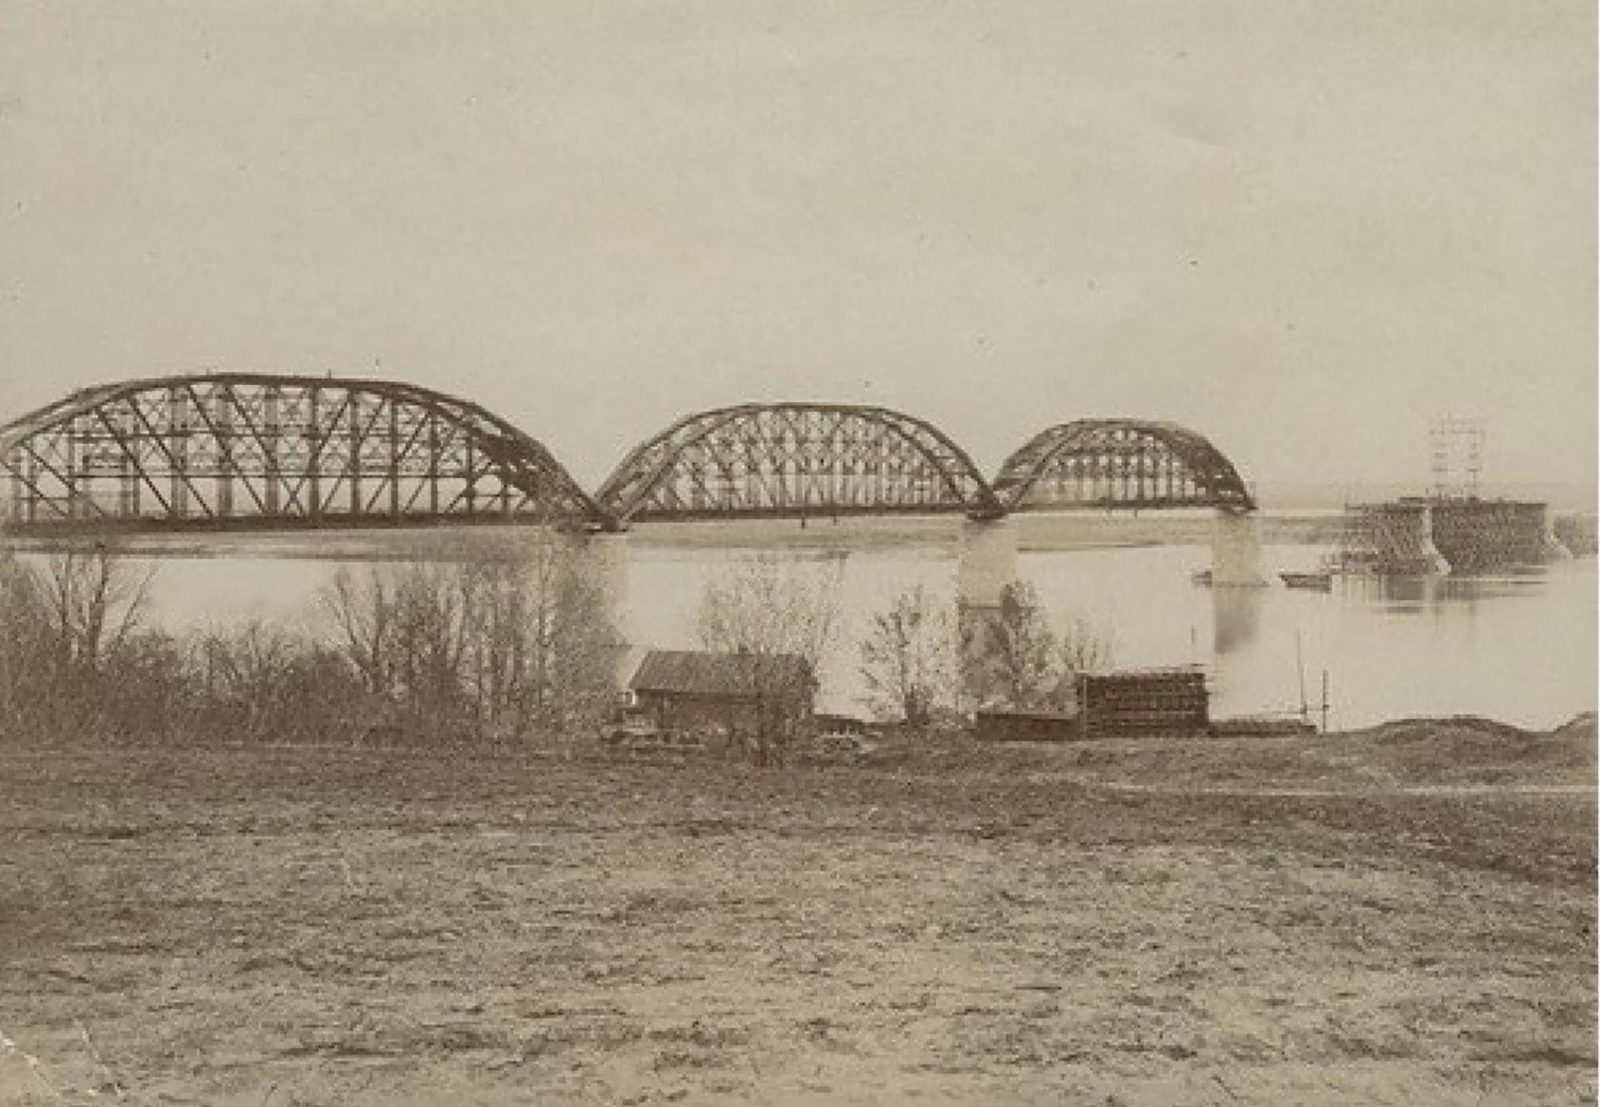 Railway bridge across the Oka River. Murom, Vladimir Province, Russia